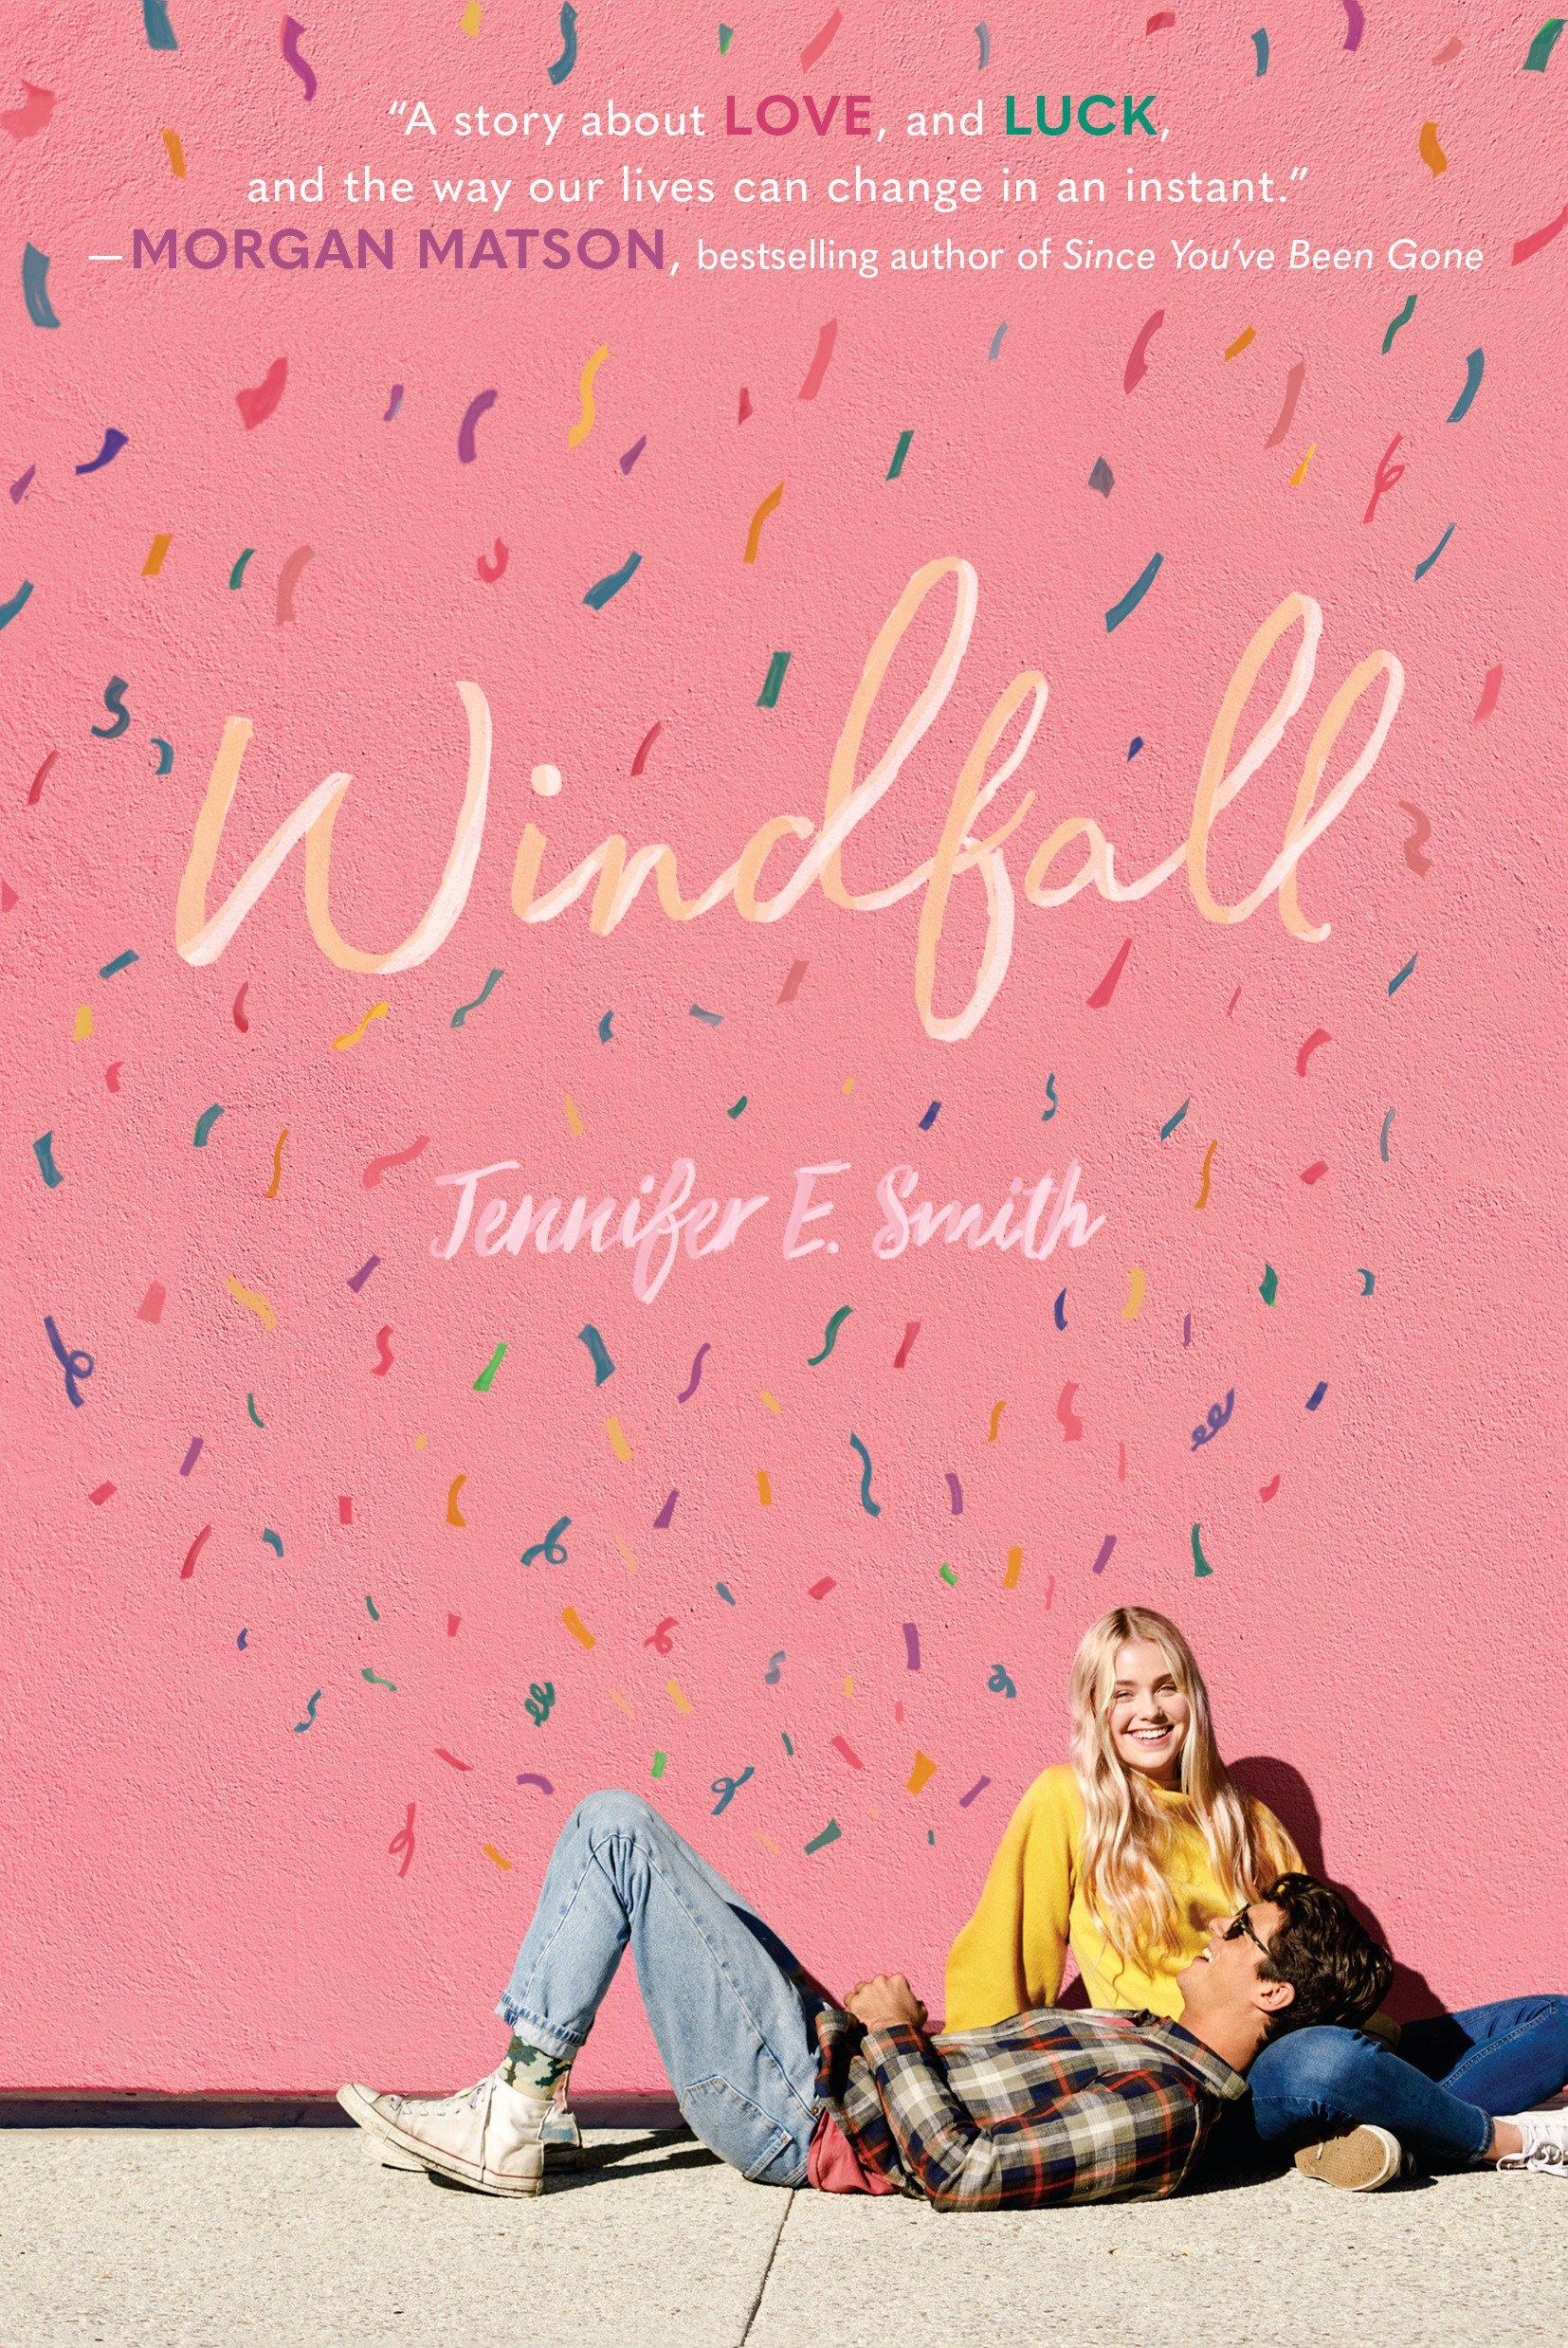 Amazon.com: Windfall (9780399559402): Smith, Jennifer E.: Books